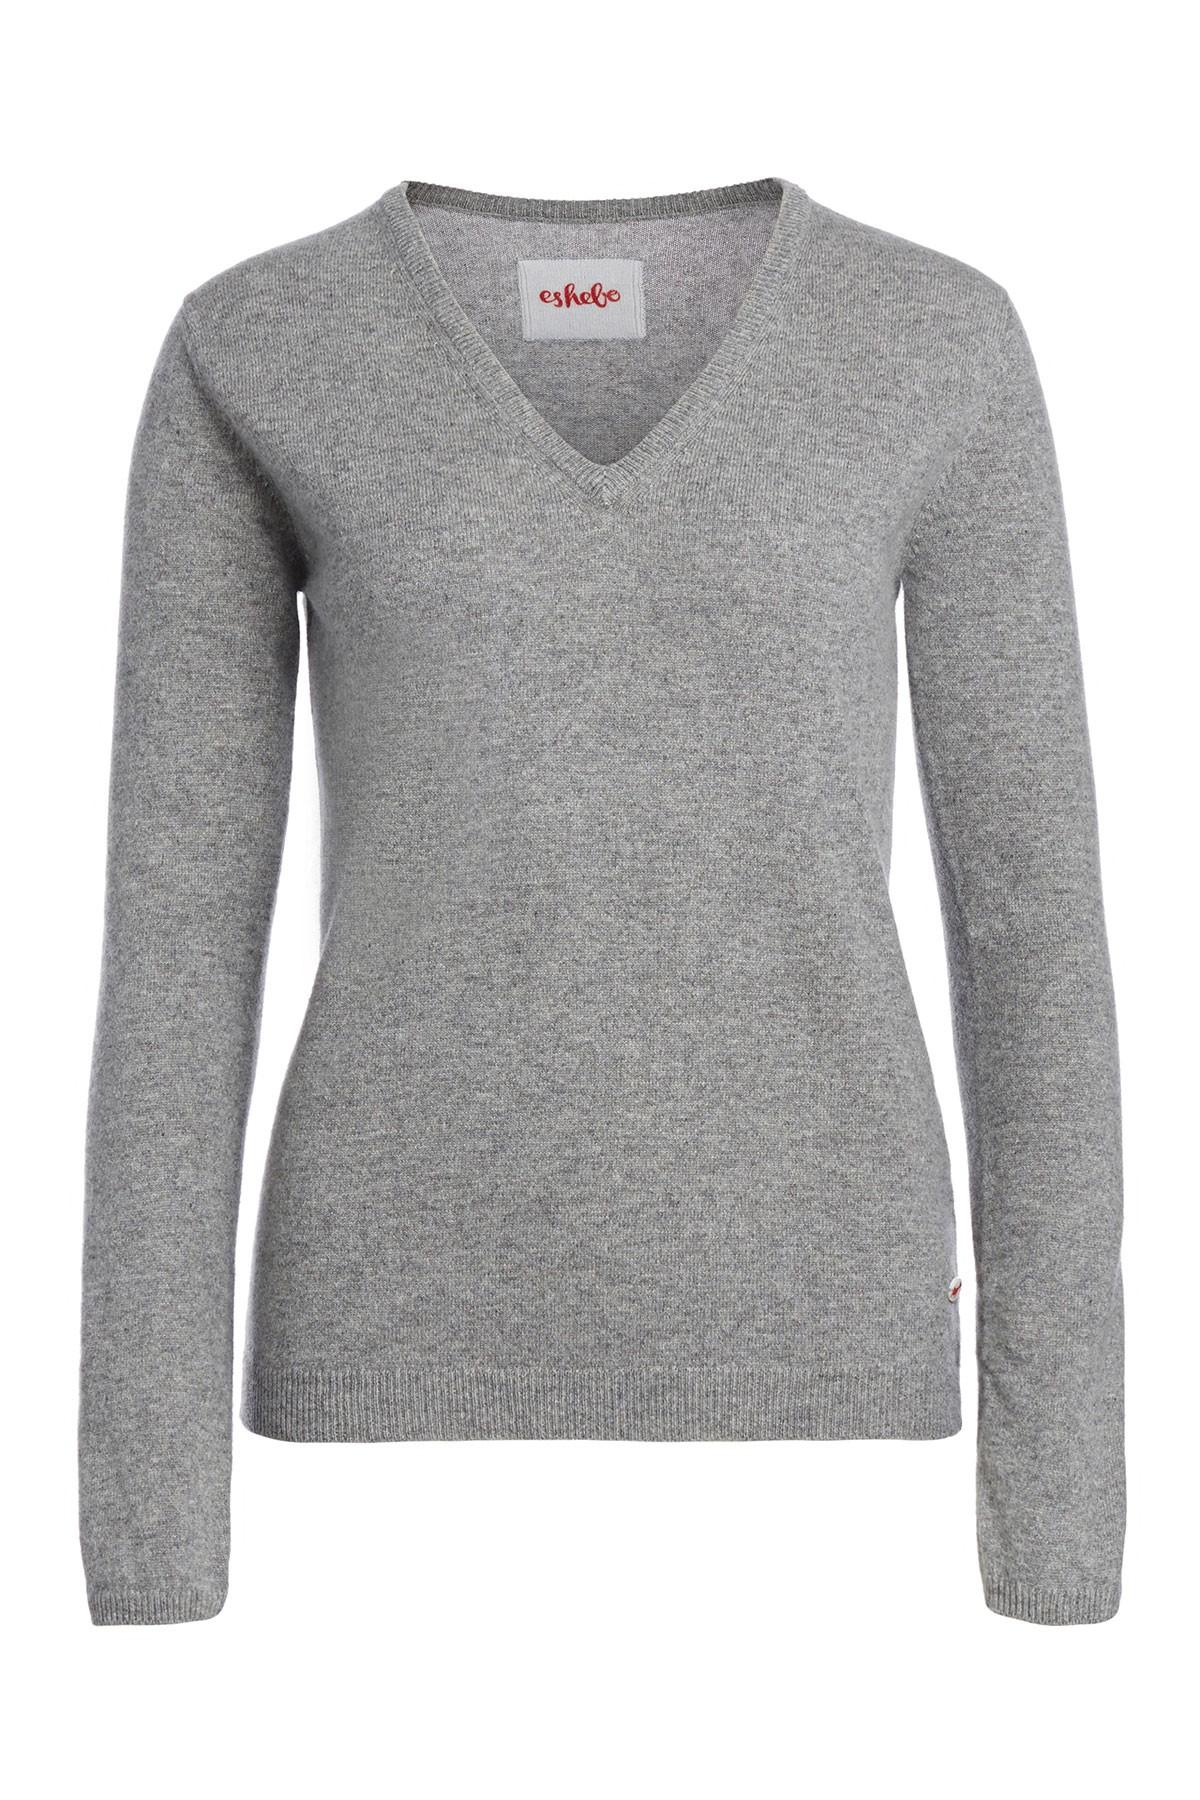 Women's cashmere V-neck sweater grey melange